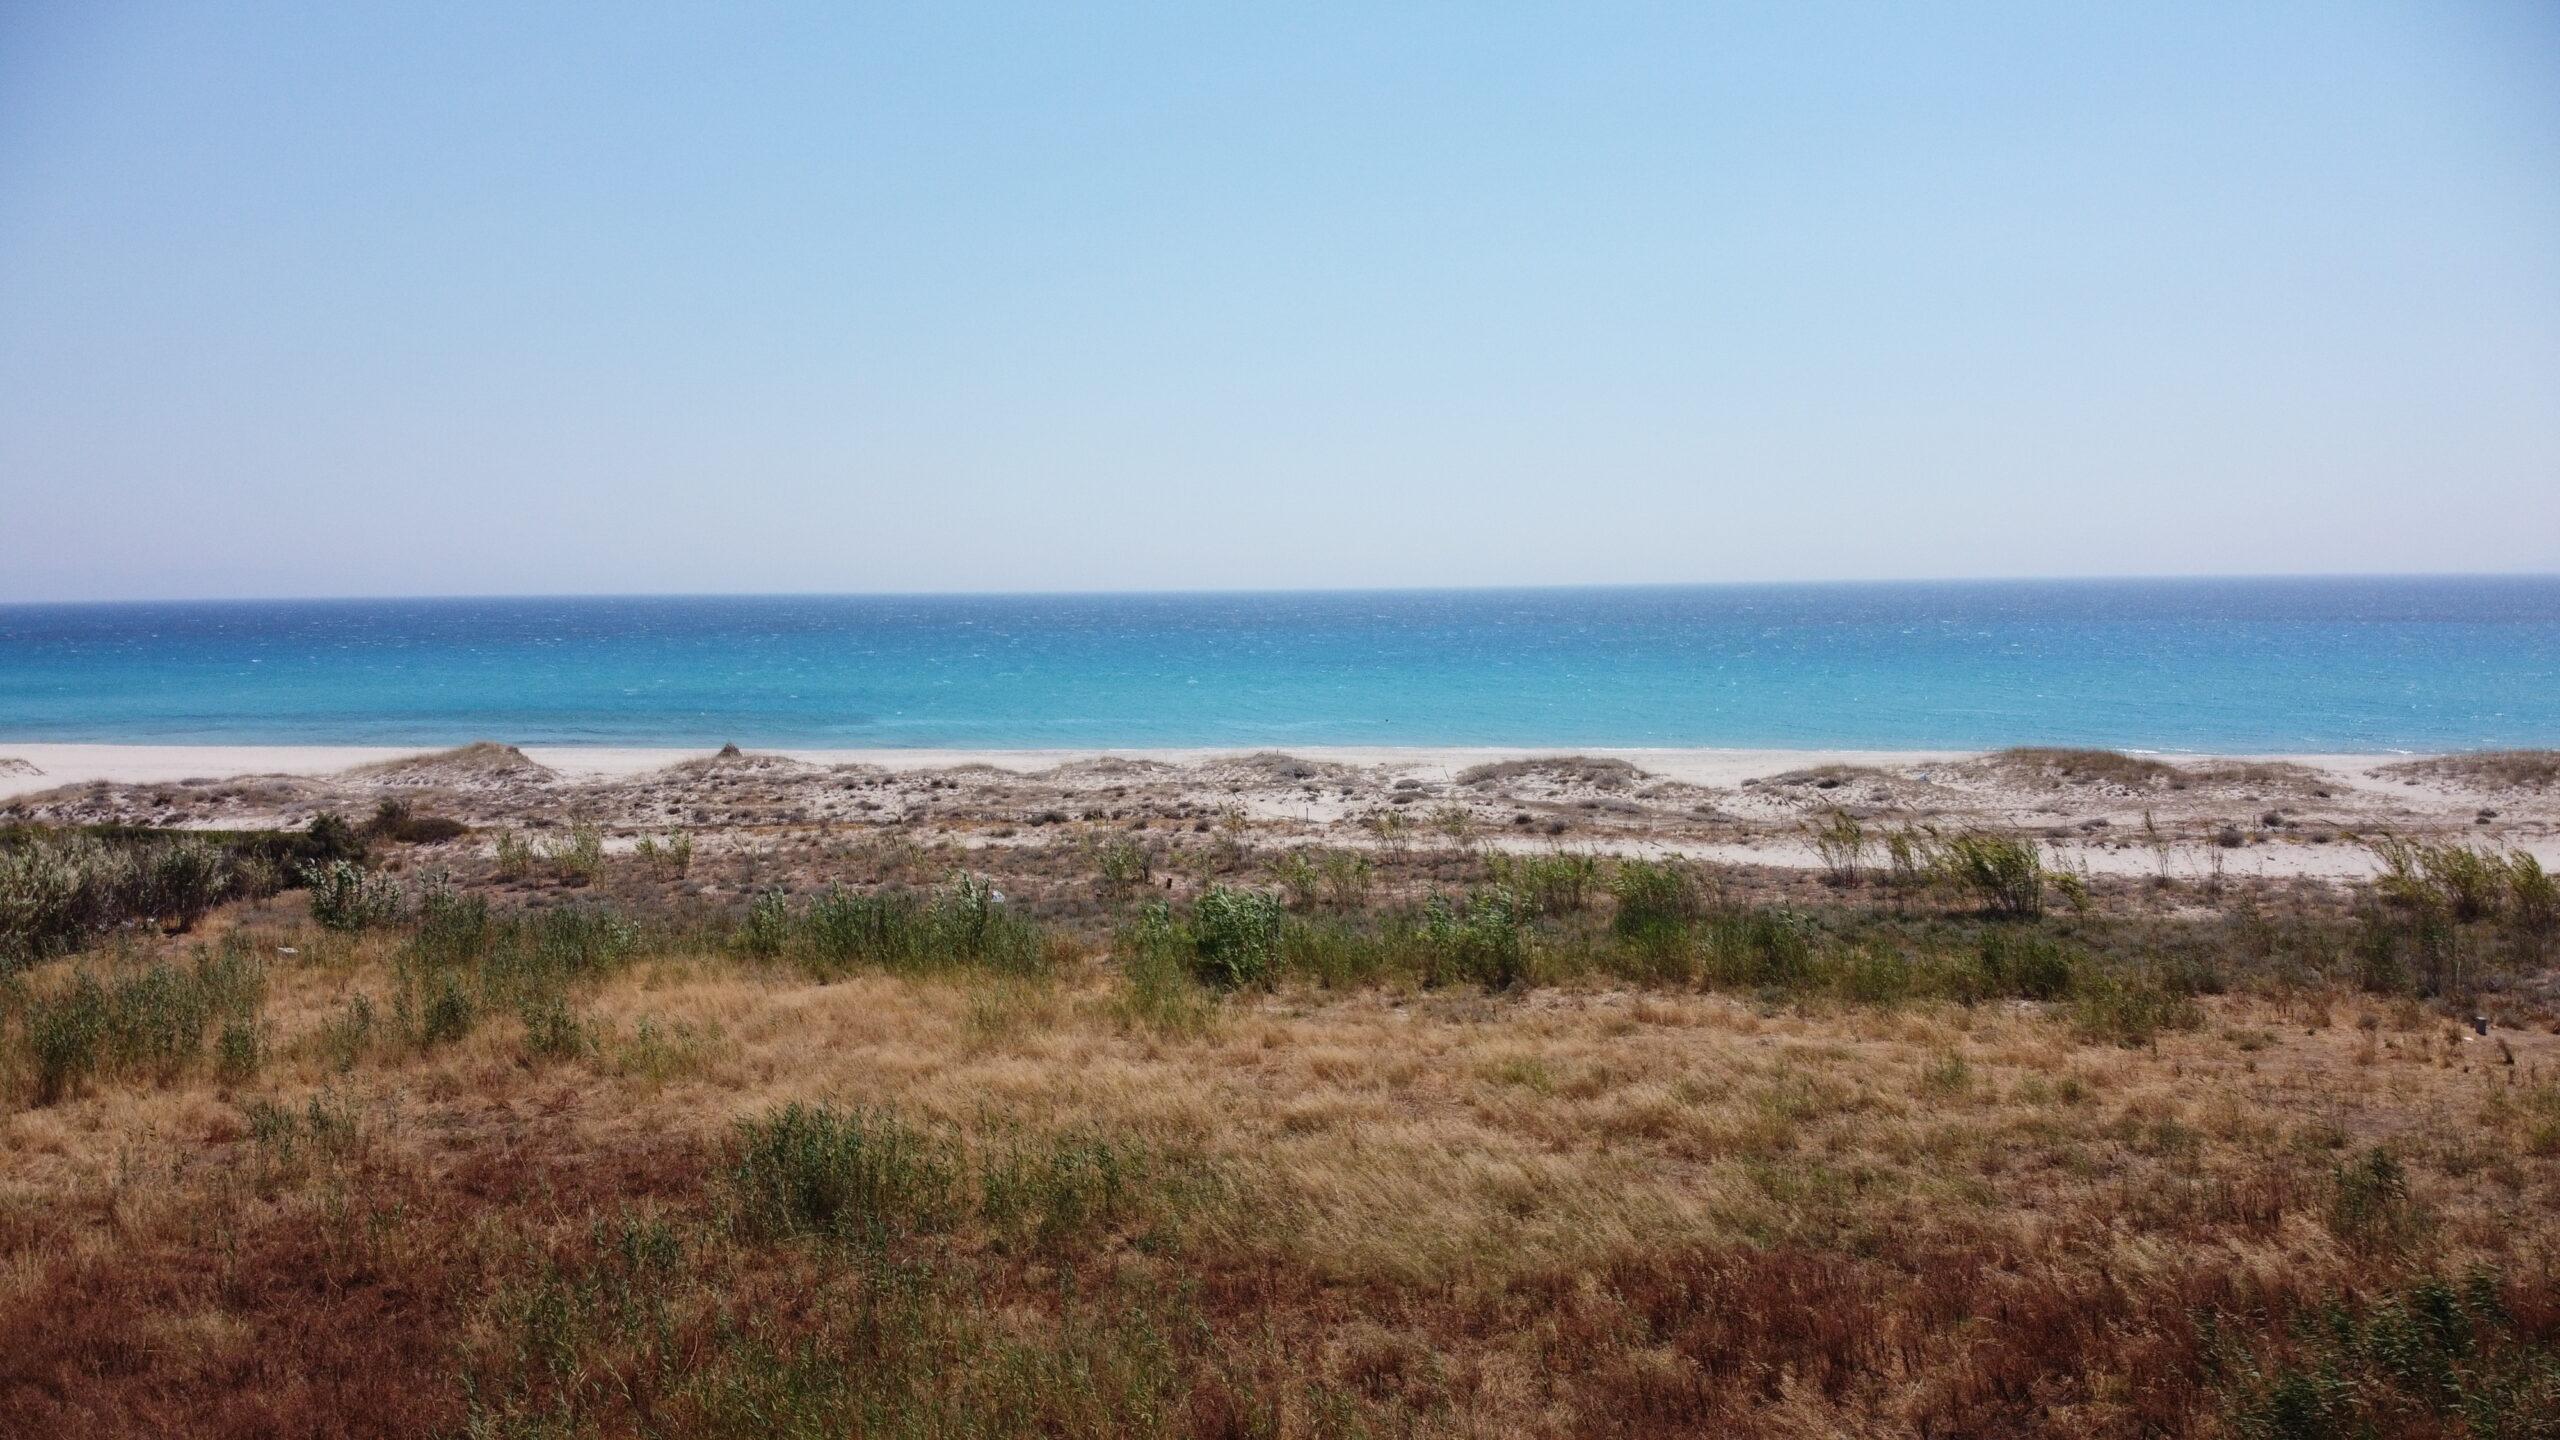 Terrain Naxos  -  ref GR-6159-S (picture 1)